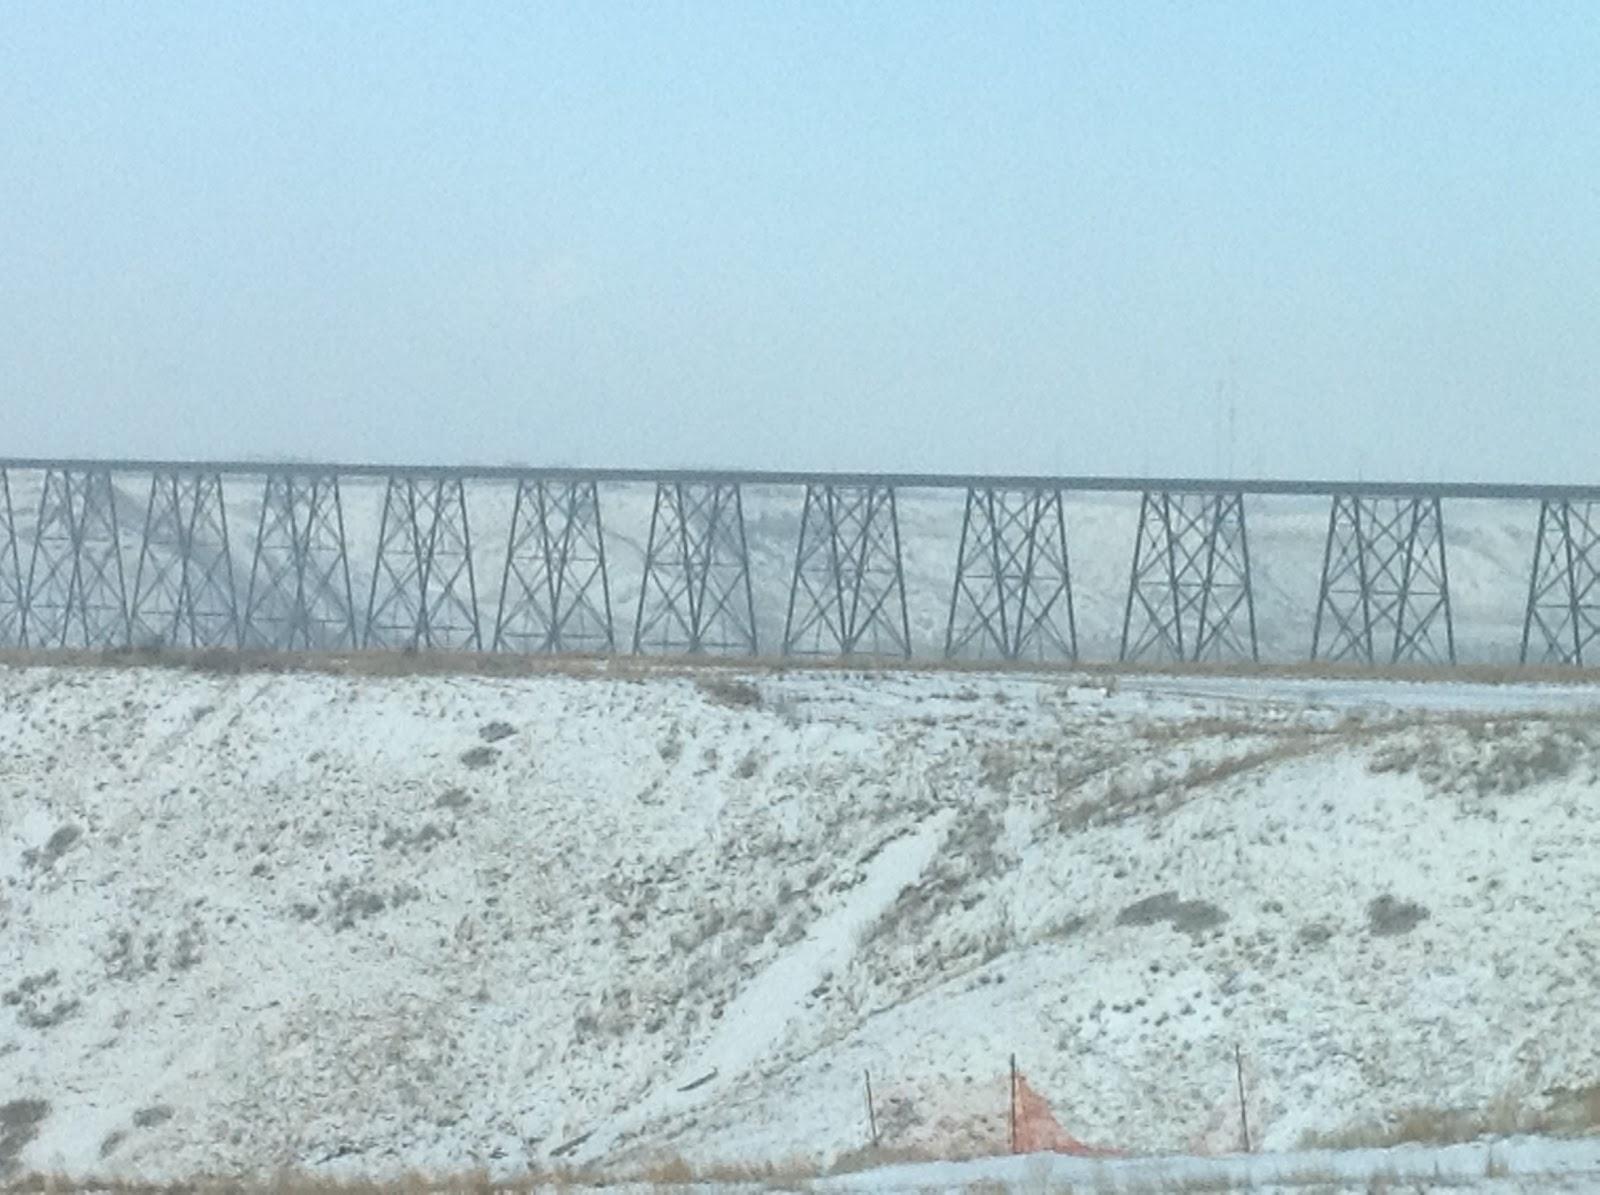 Lethbridge's High Level Bridge after snow, January 2013, photo by Belinda Crowson